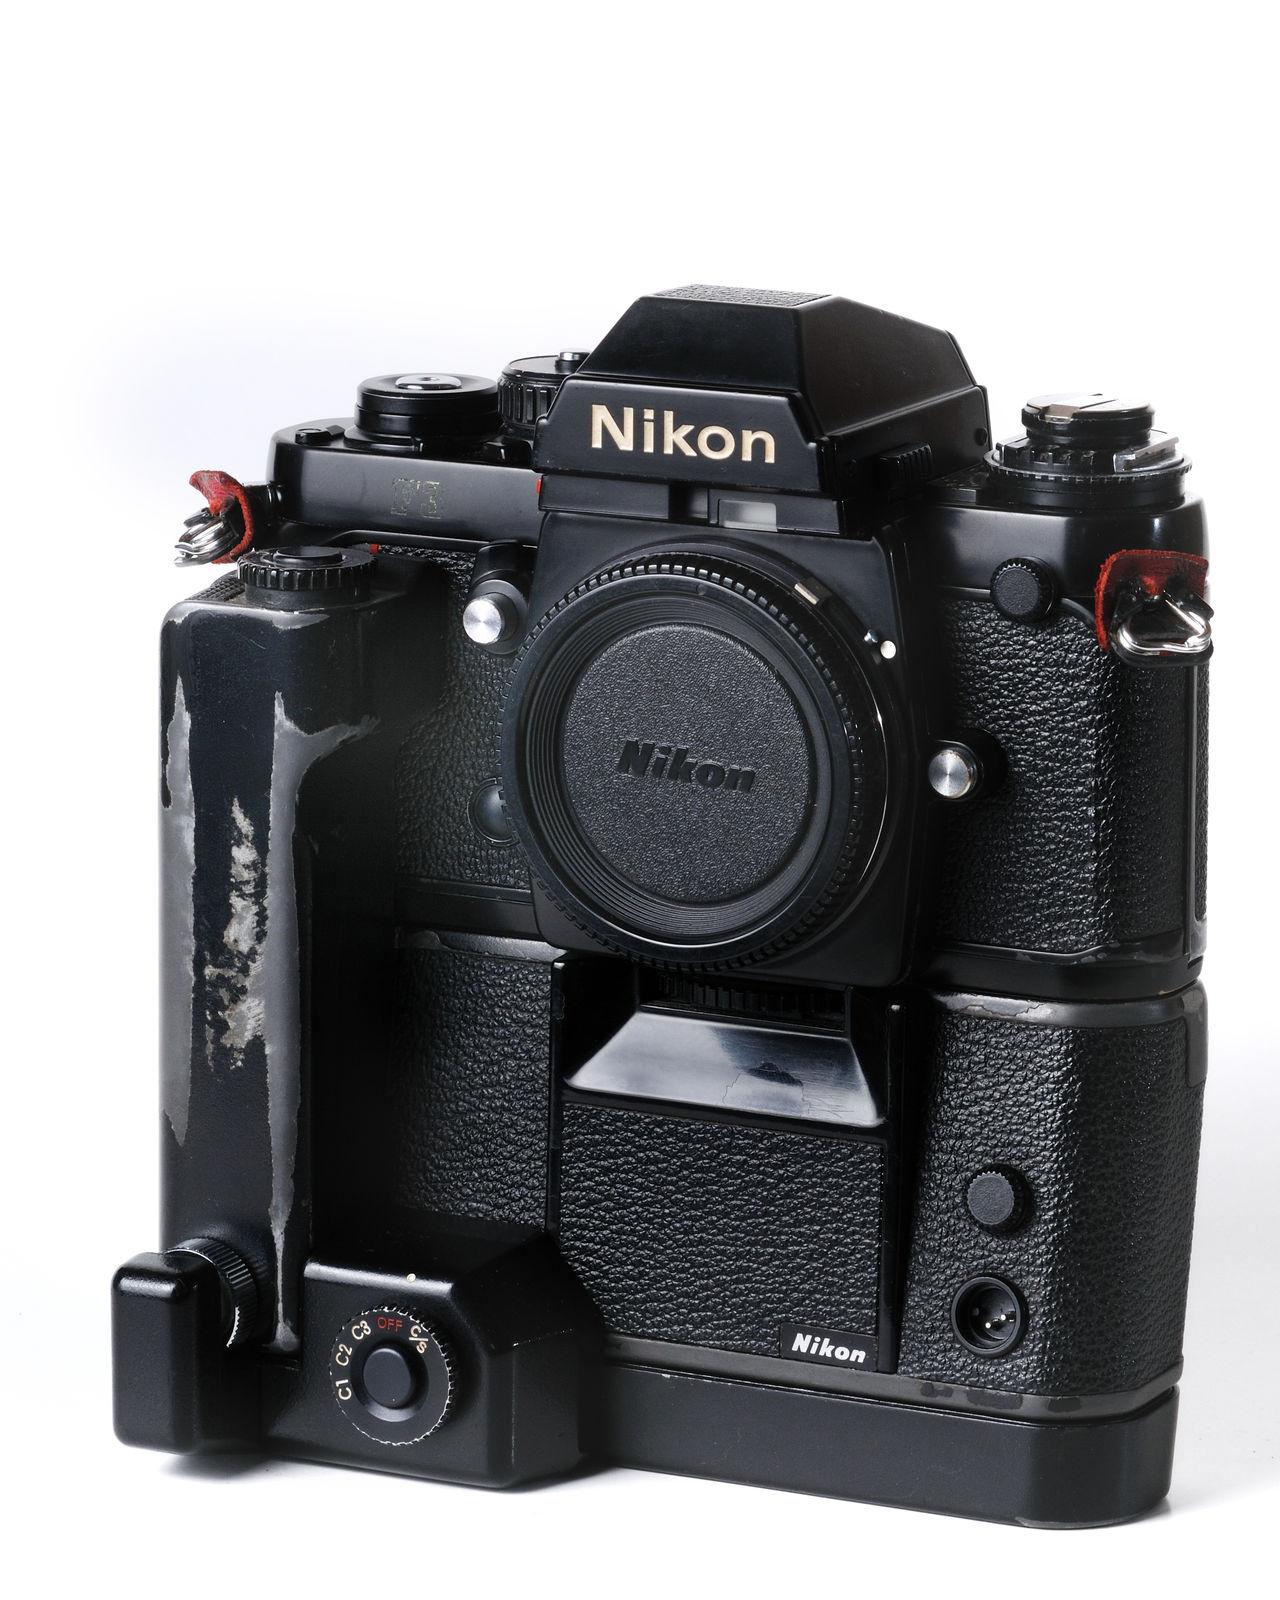 Camera Porn Film Camera Nikon Nikon Camera Nikon F3 Photography Themes Studio Shot White Background